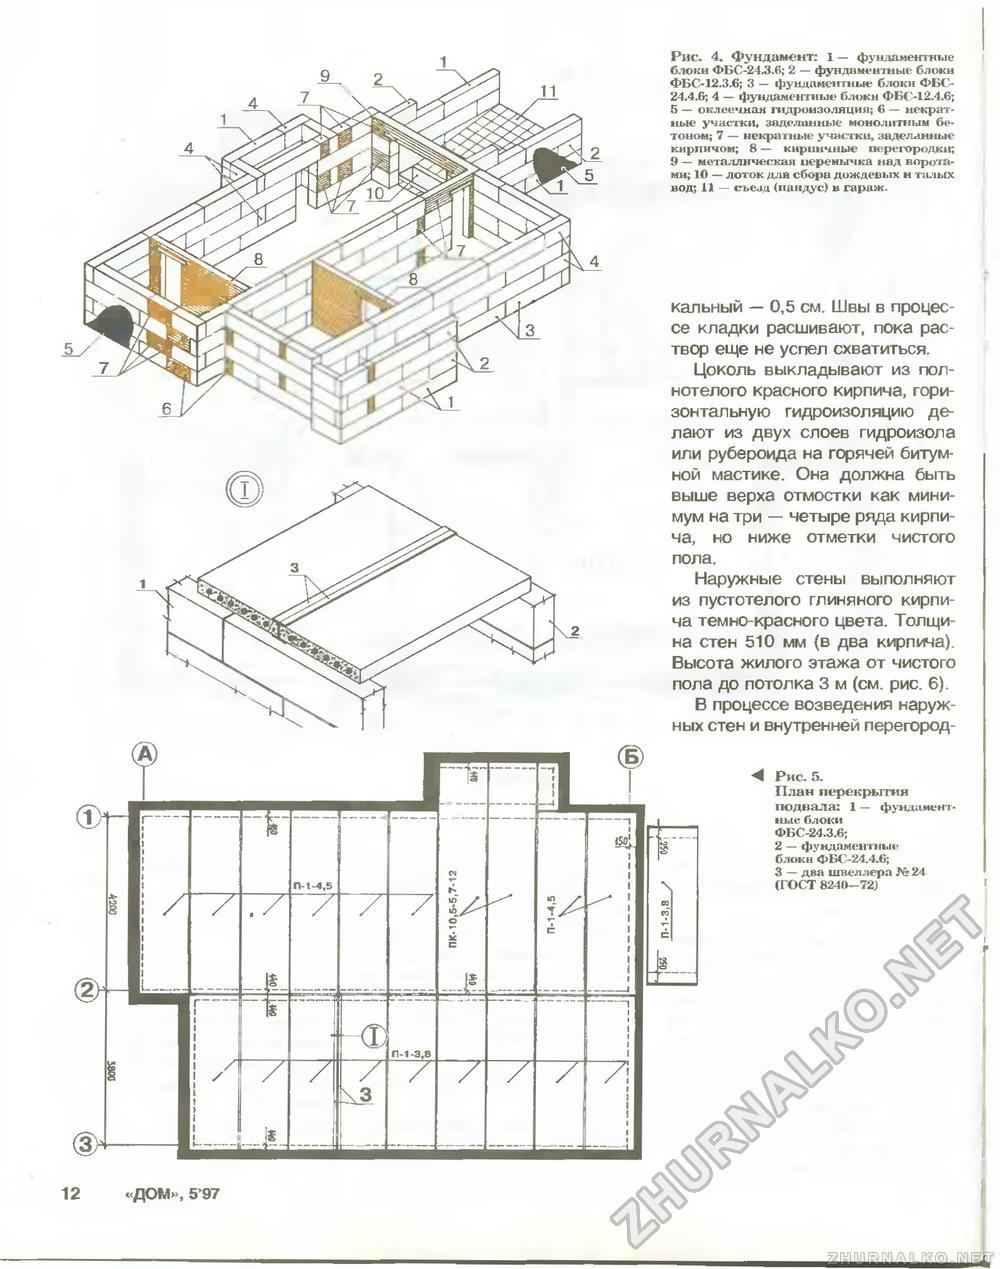 Фундамент для дома в схемах